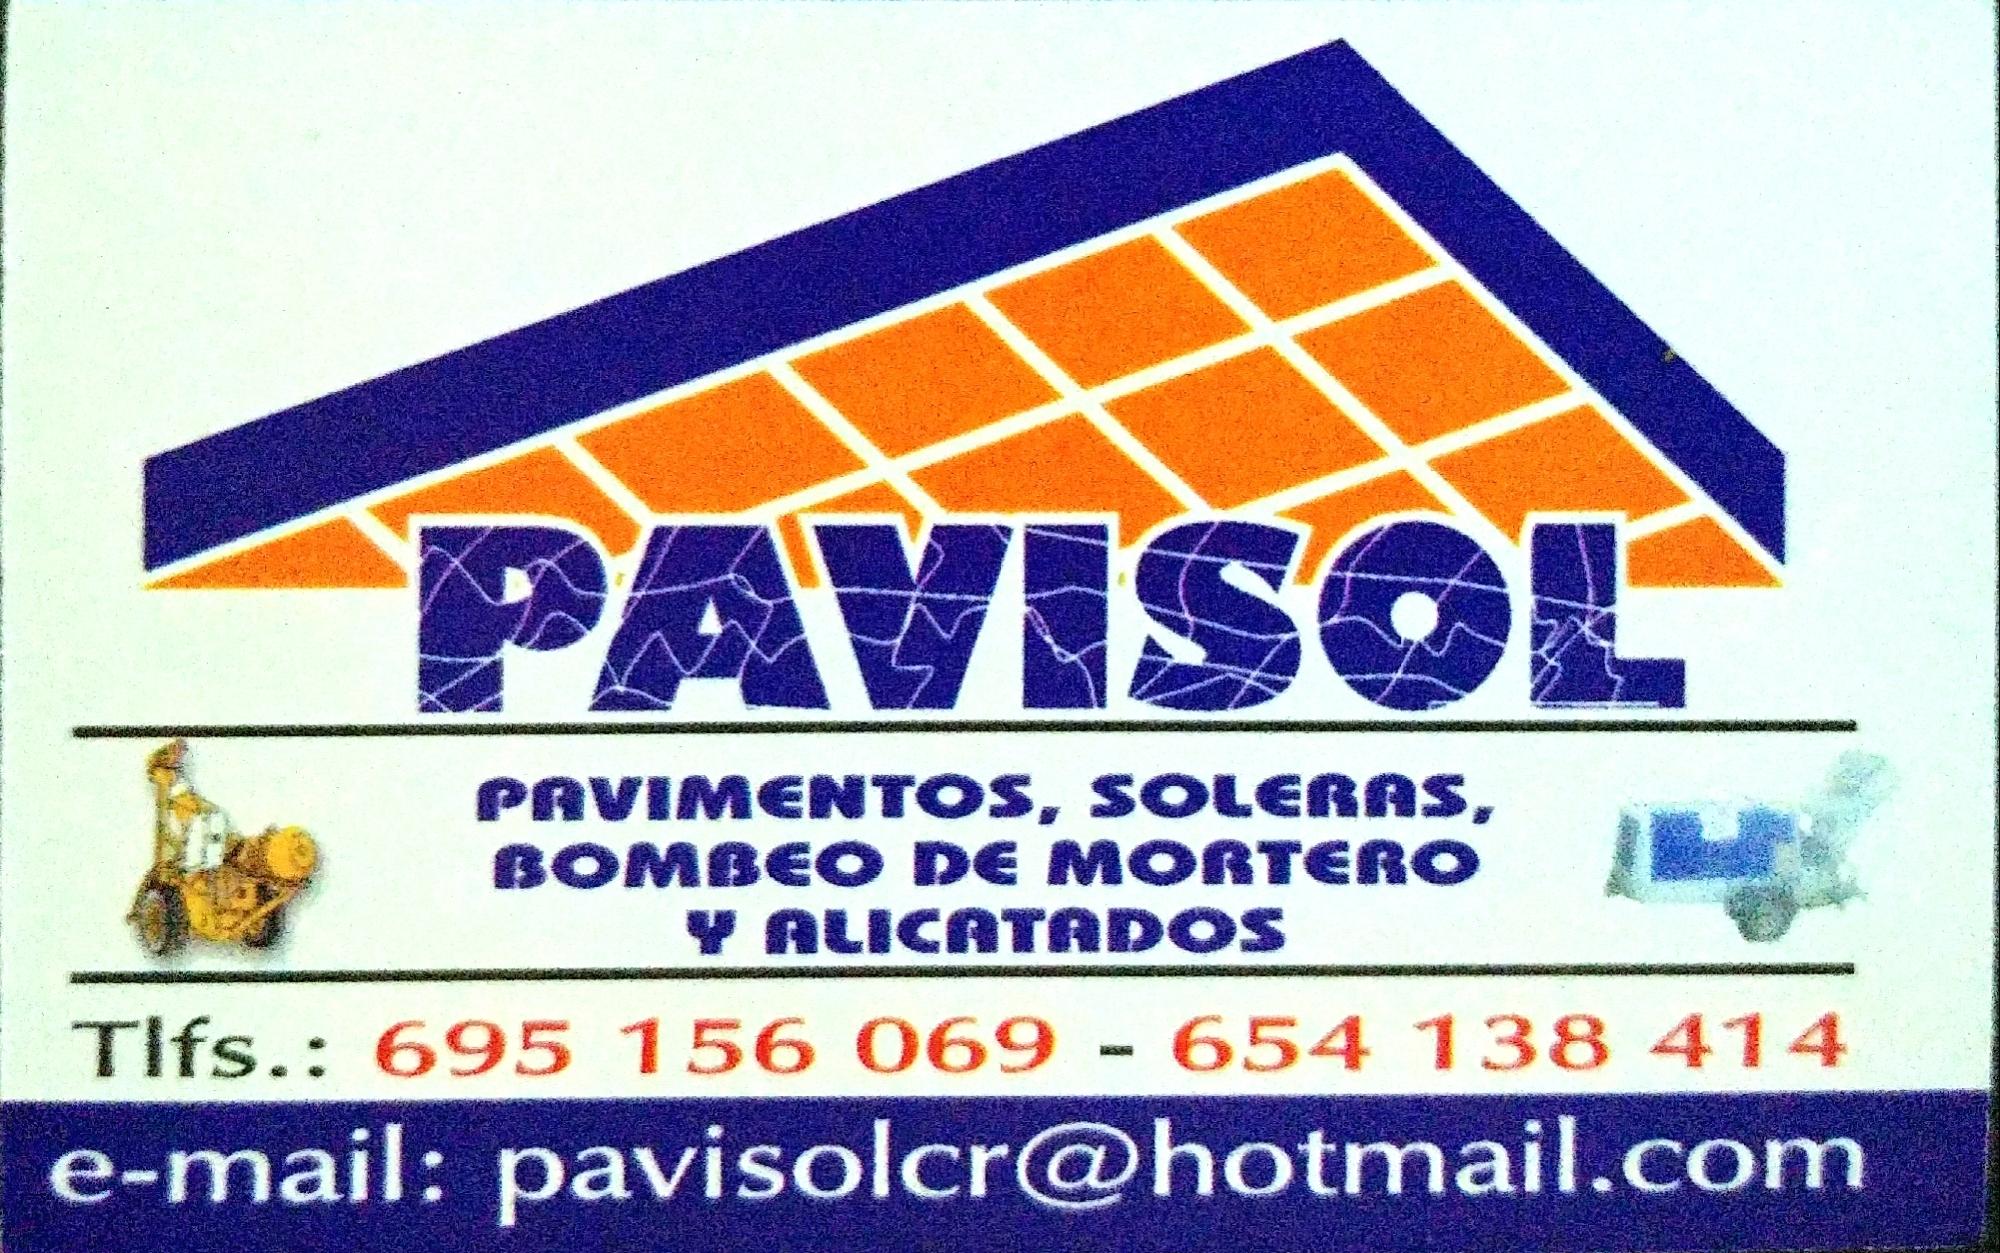 Pavisol